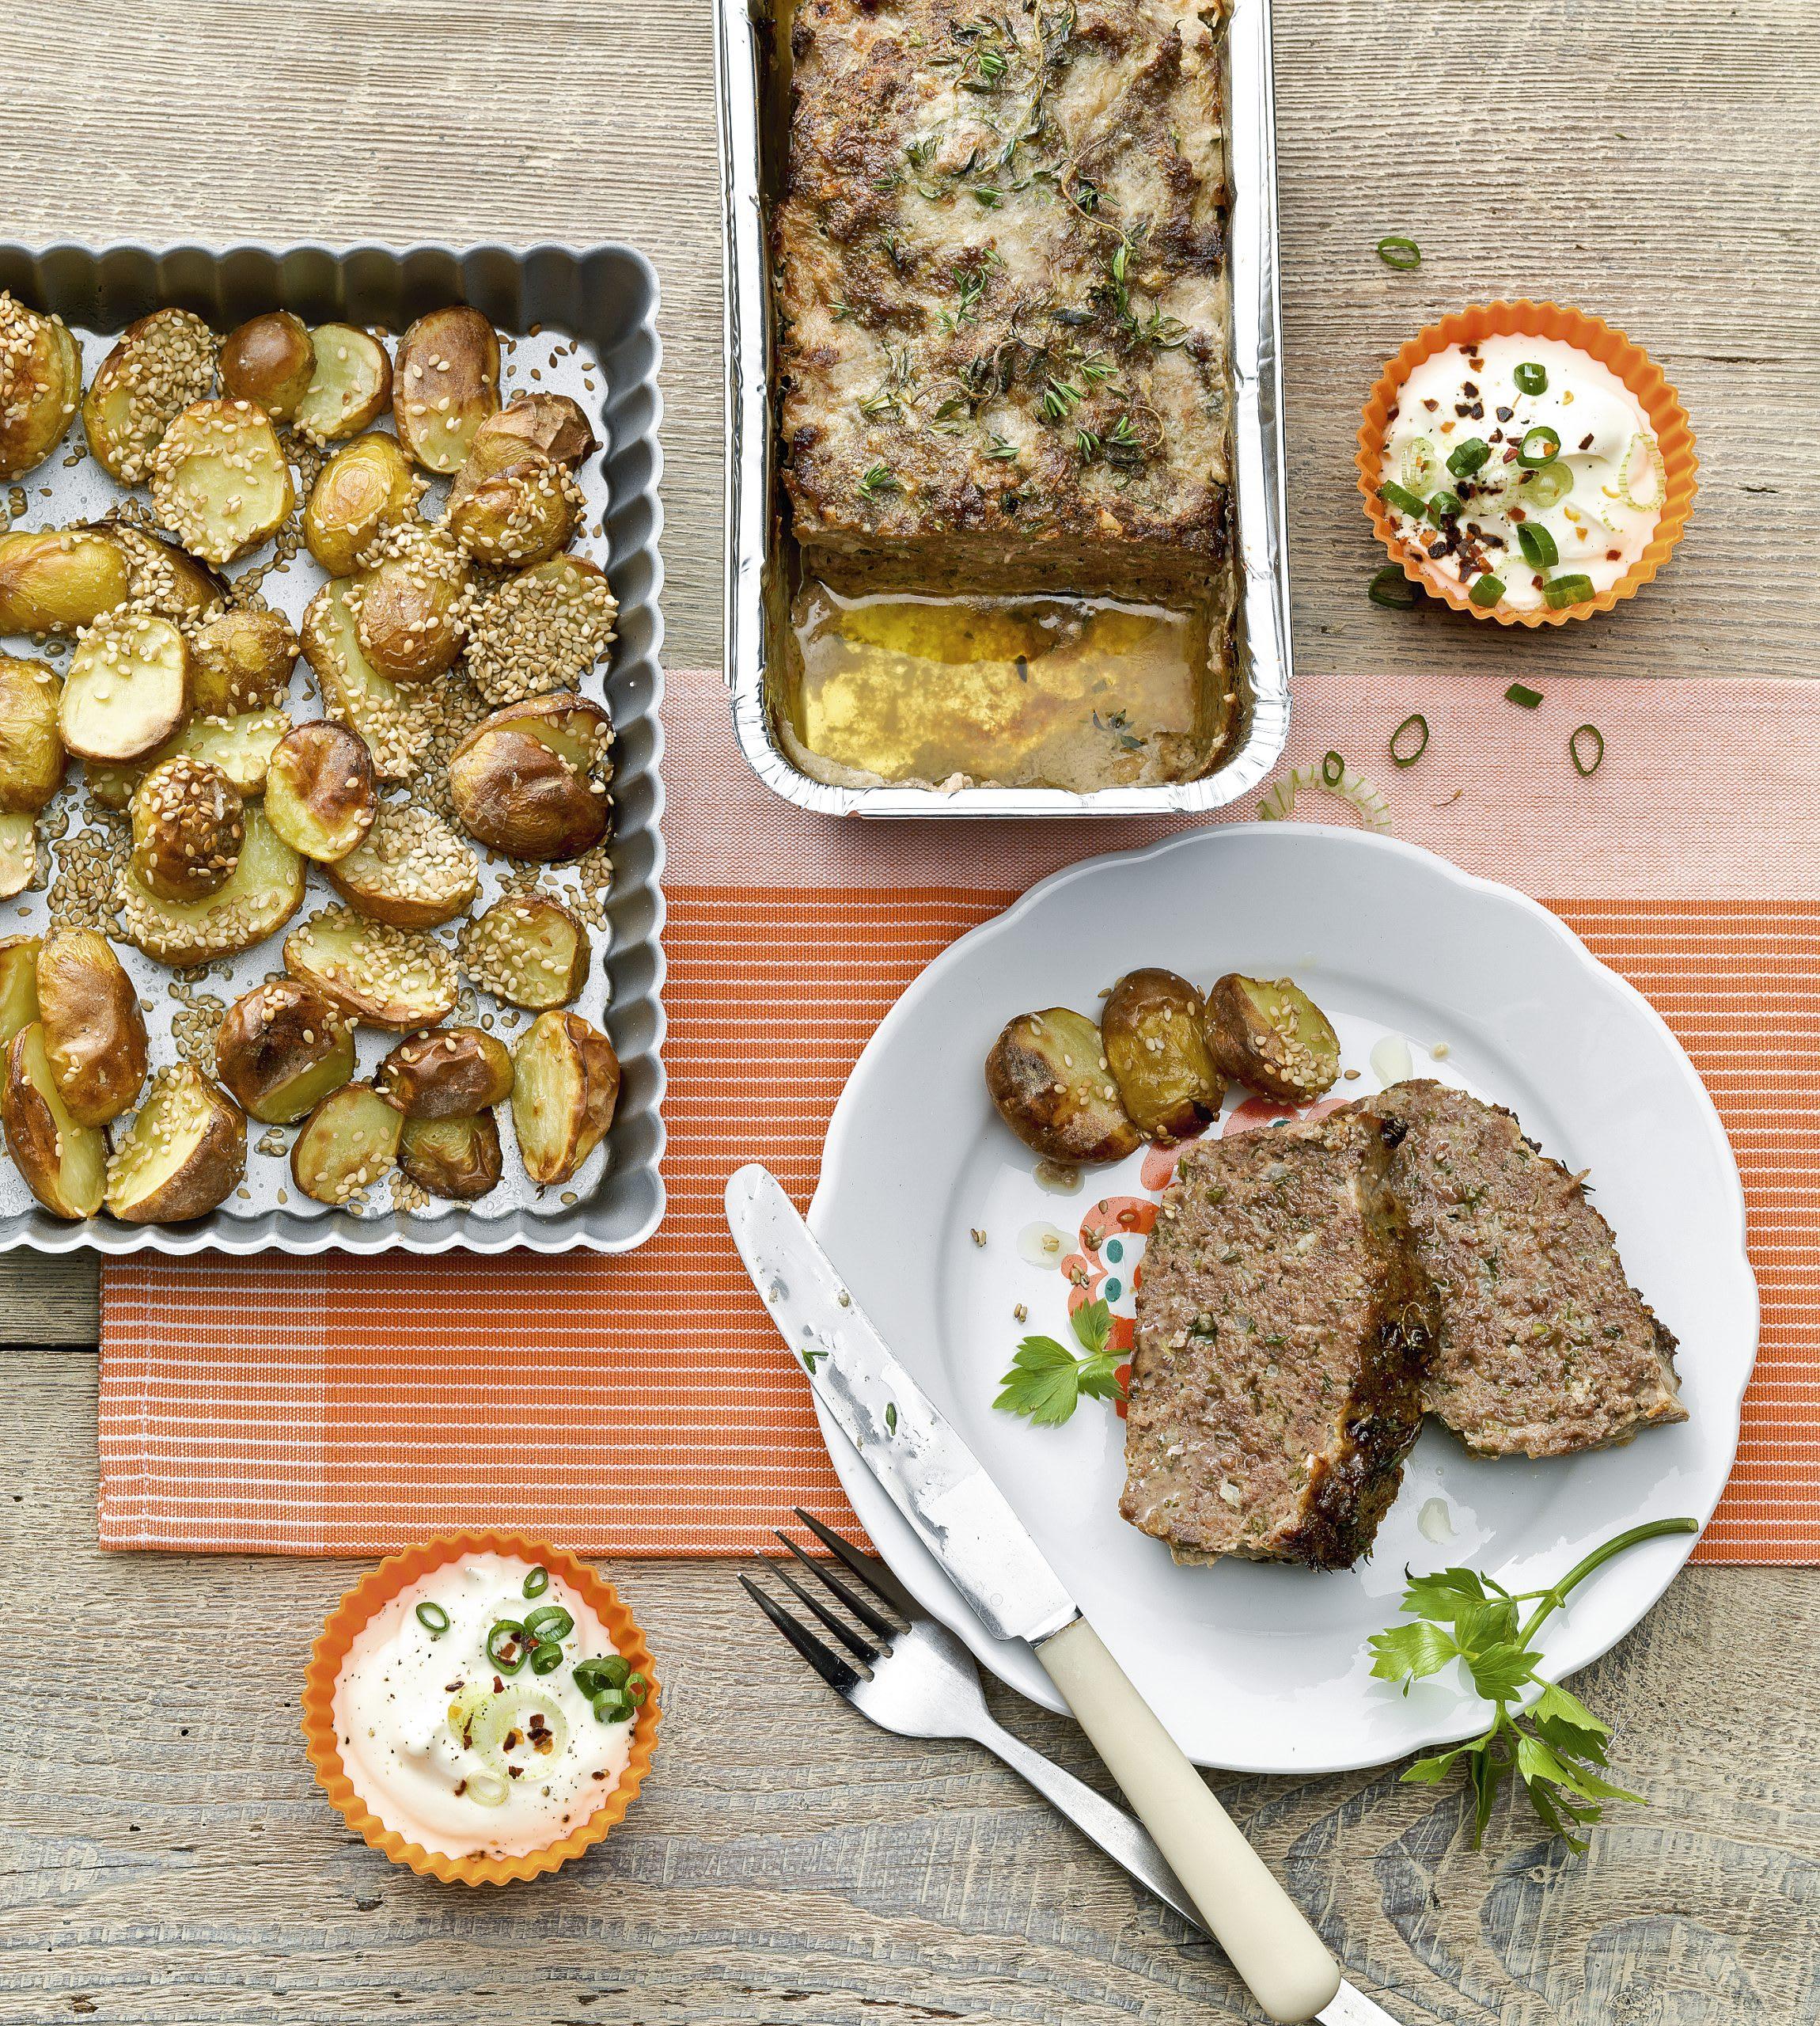 Kräuter-Hackbraten mit Sesam-Kartoffeln und Dip